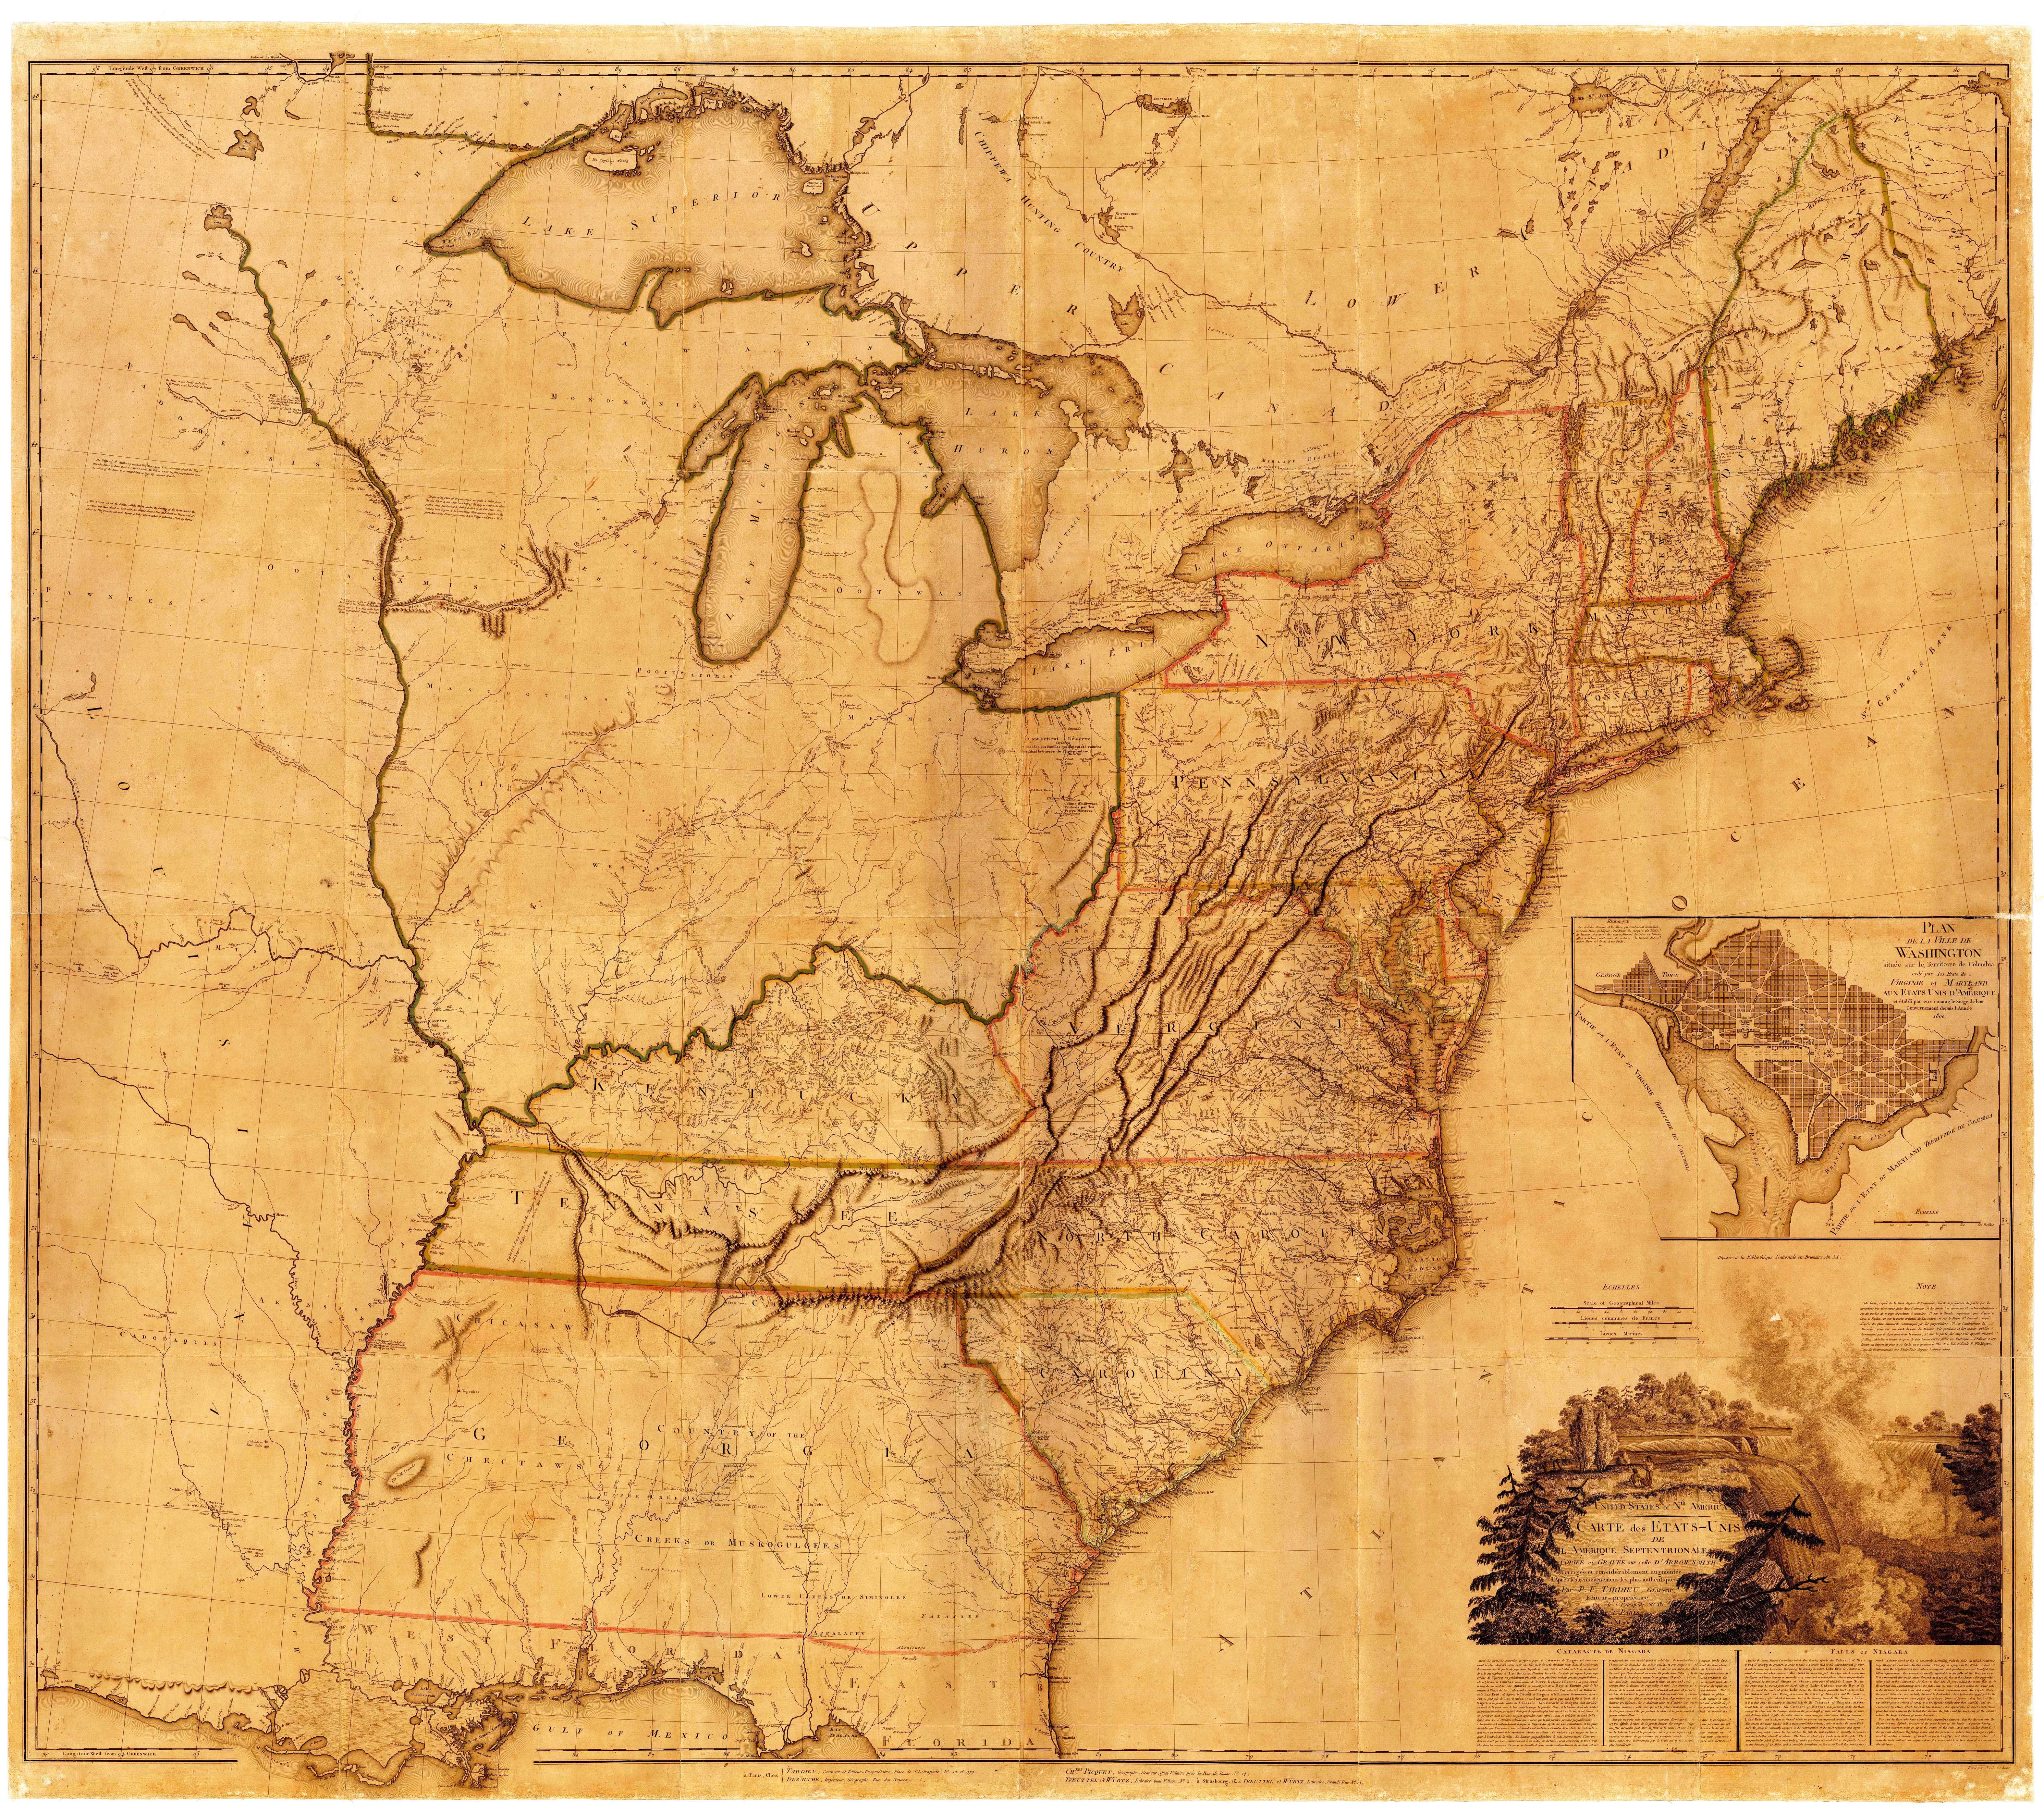 United States Of Nth America Carte Des Etats Unis De L Amerique